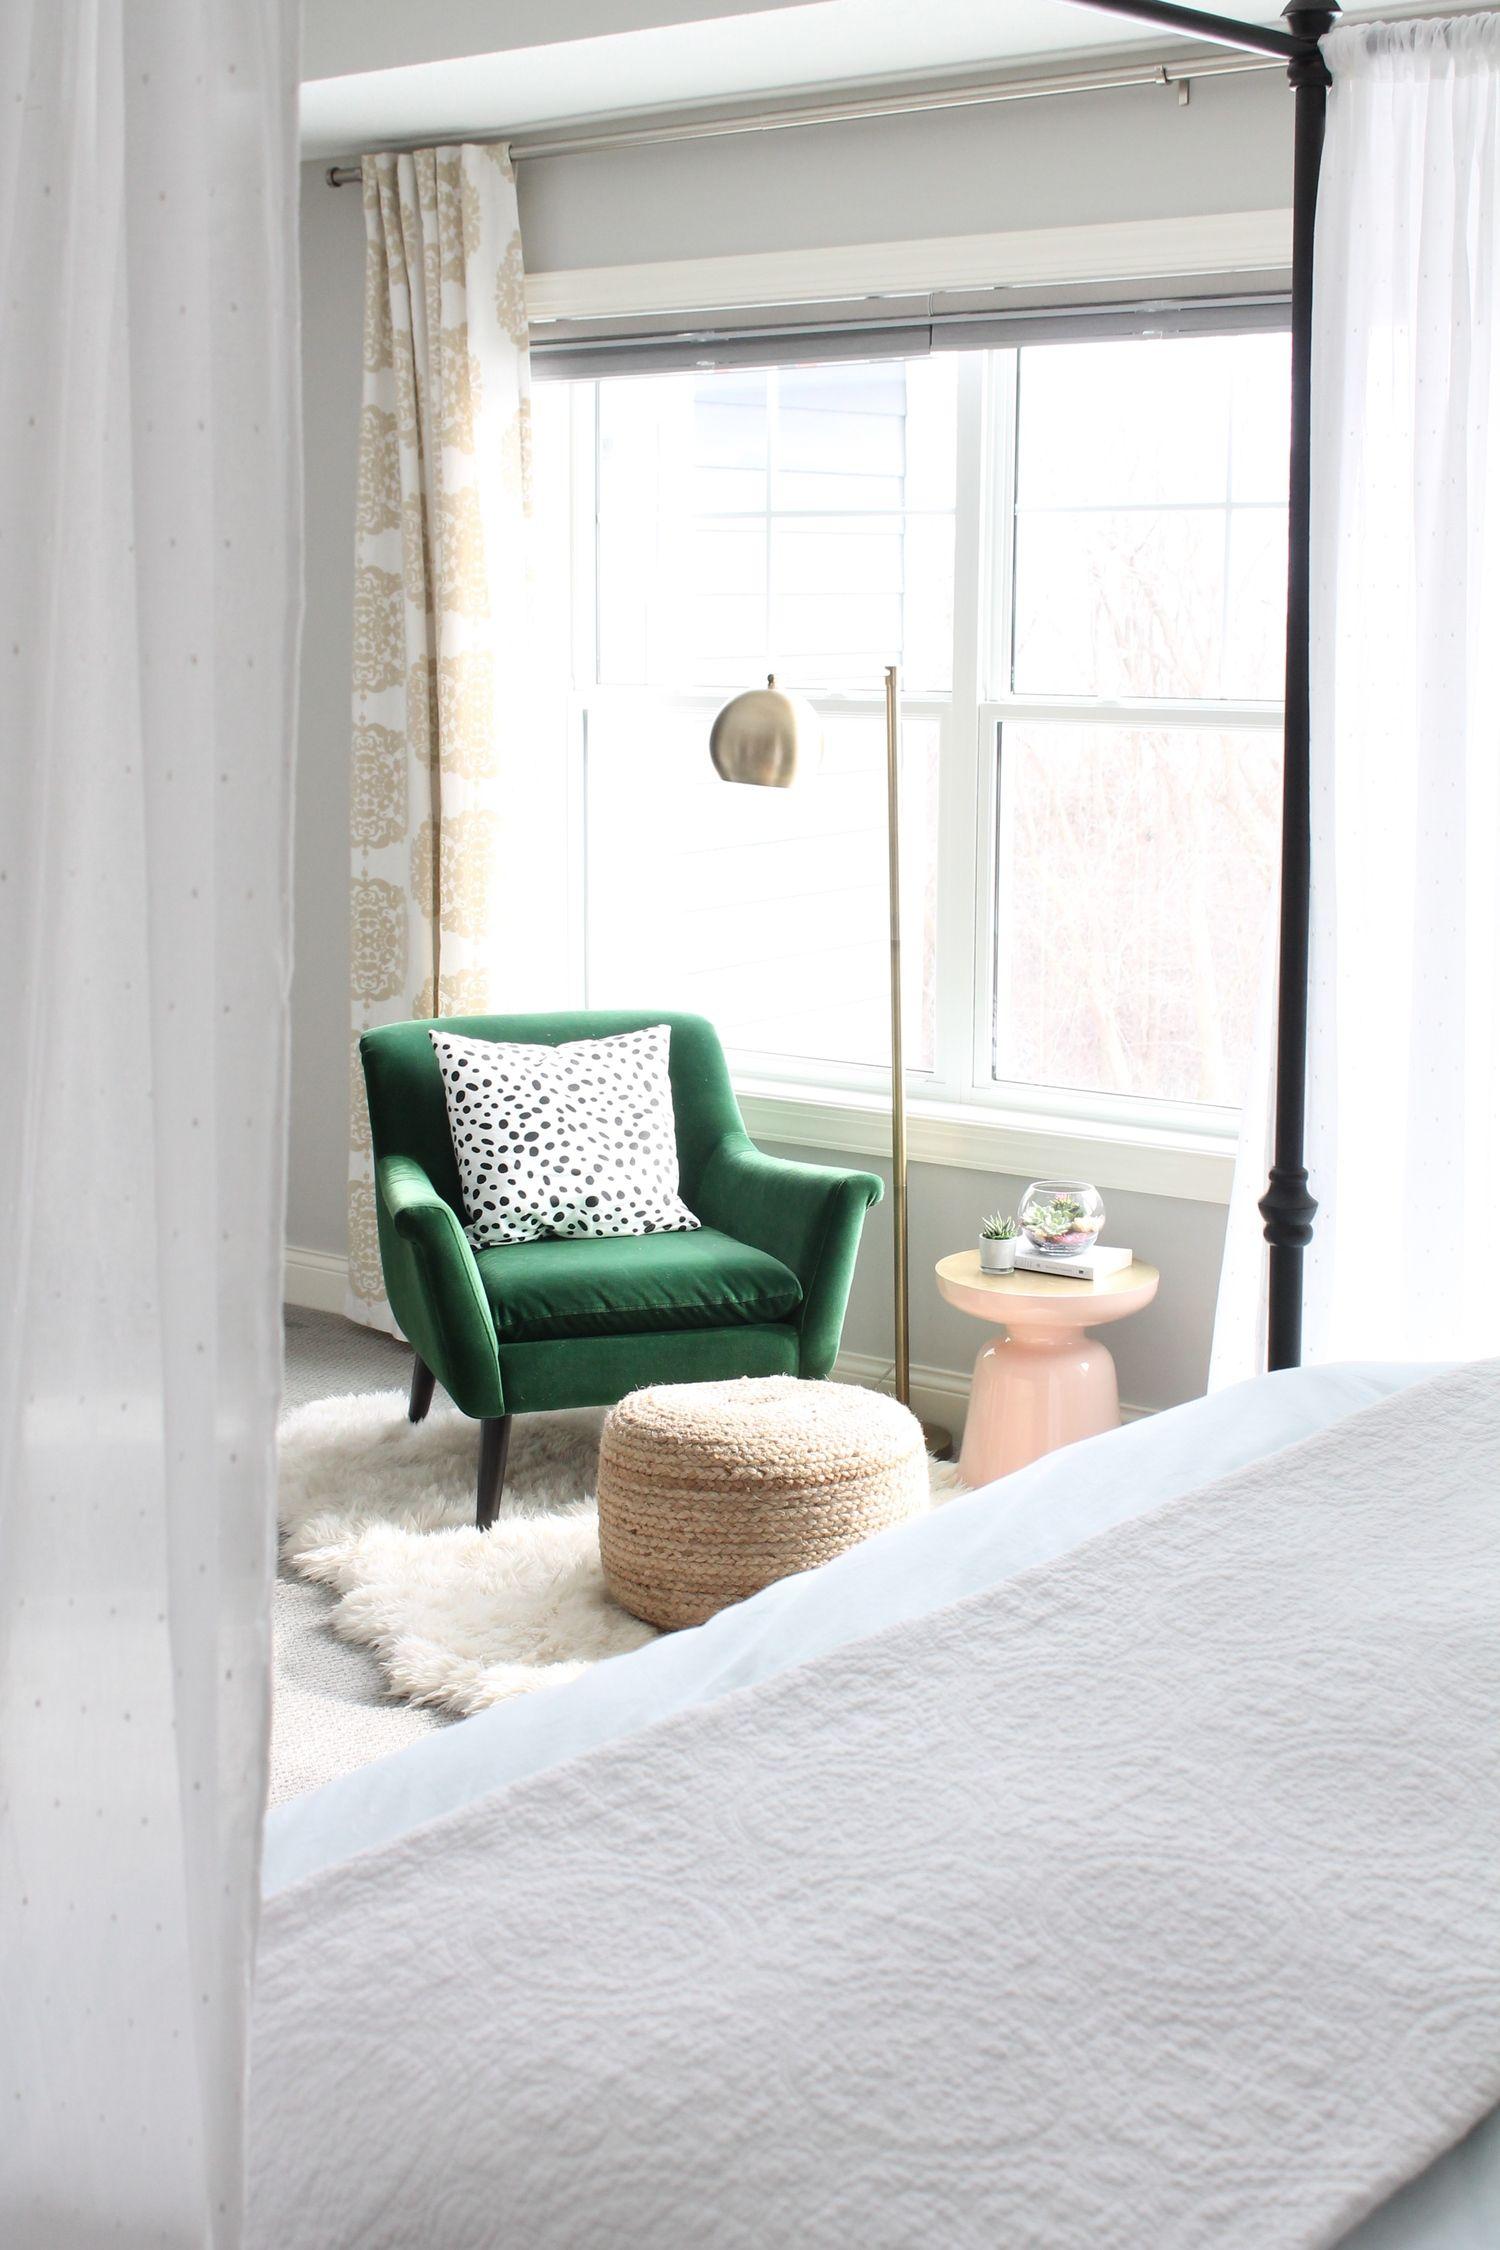 Master bedroom green  Feb  Master Bedroom Reveal  Bedroom green Green velvet and